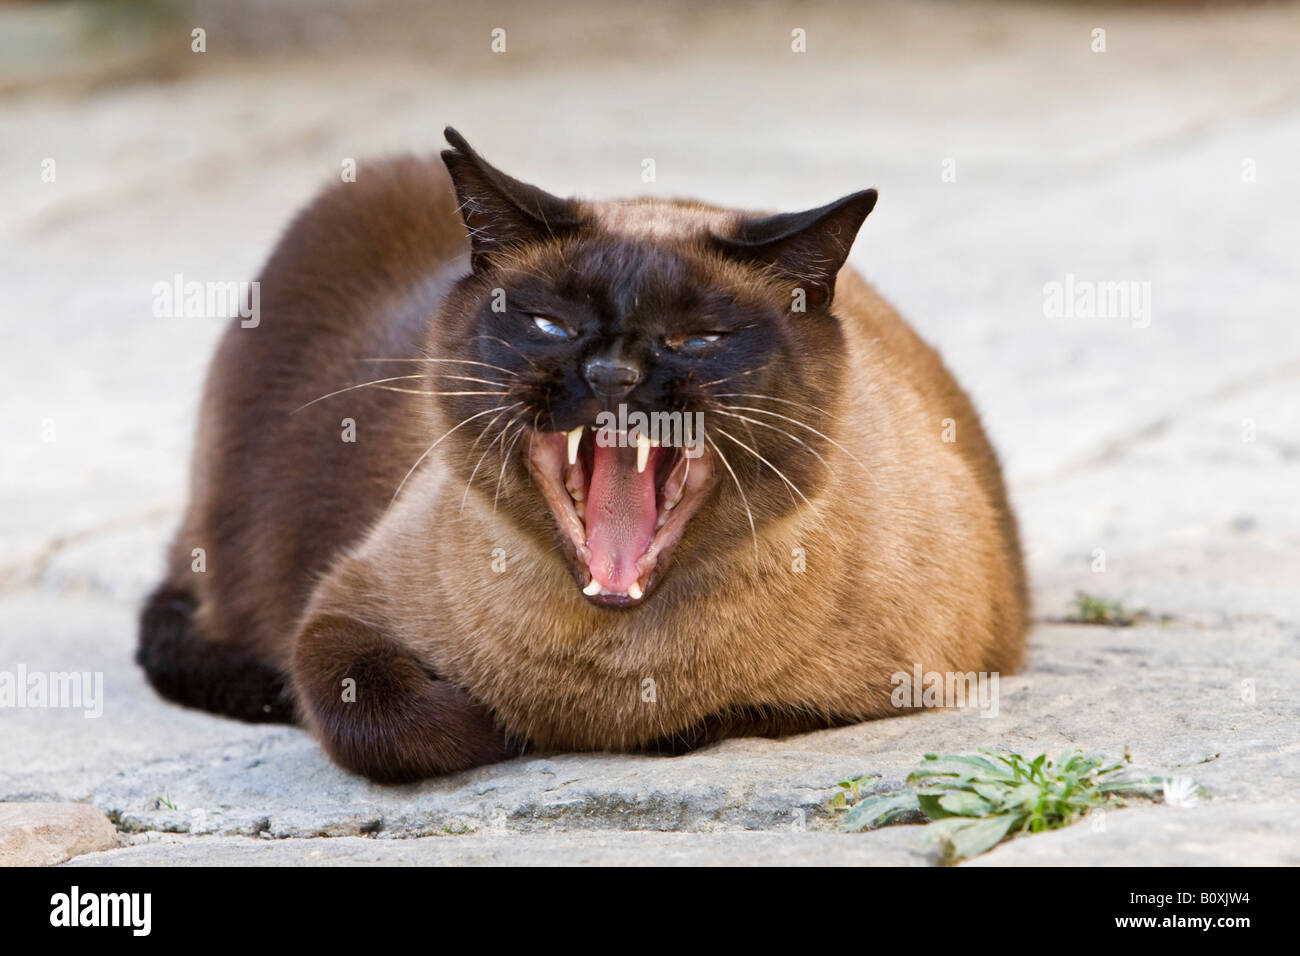 Siamese cat yawning portrait Stock Royalty Free Image